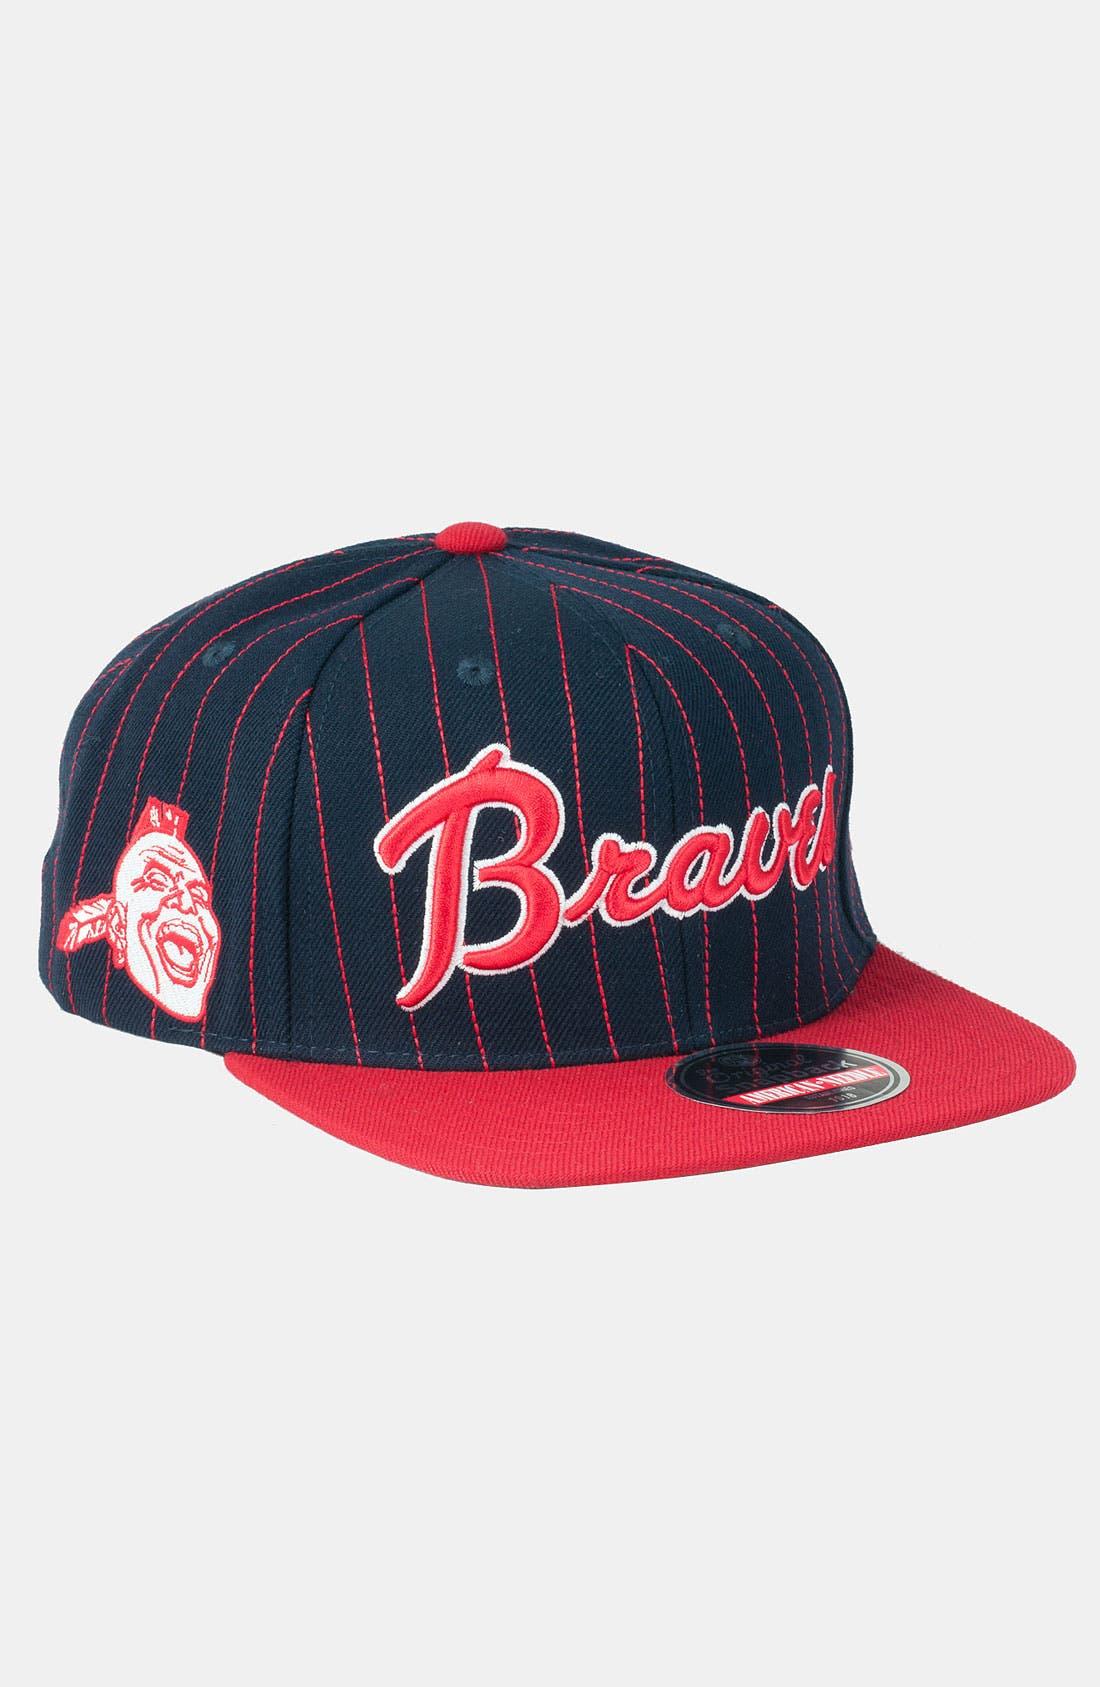 Alternate Image 1 Selected - American Needle 'Braves' Snapback Baseball Cap